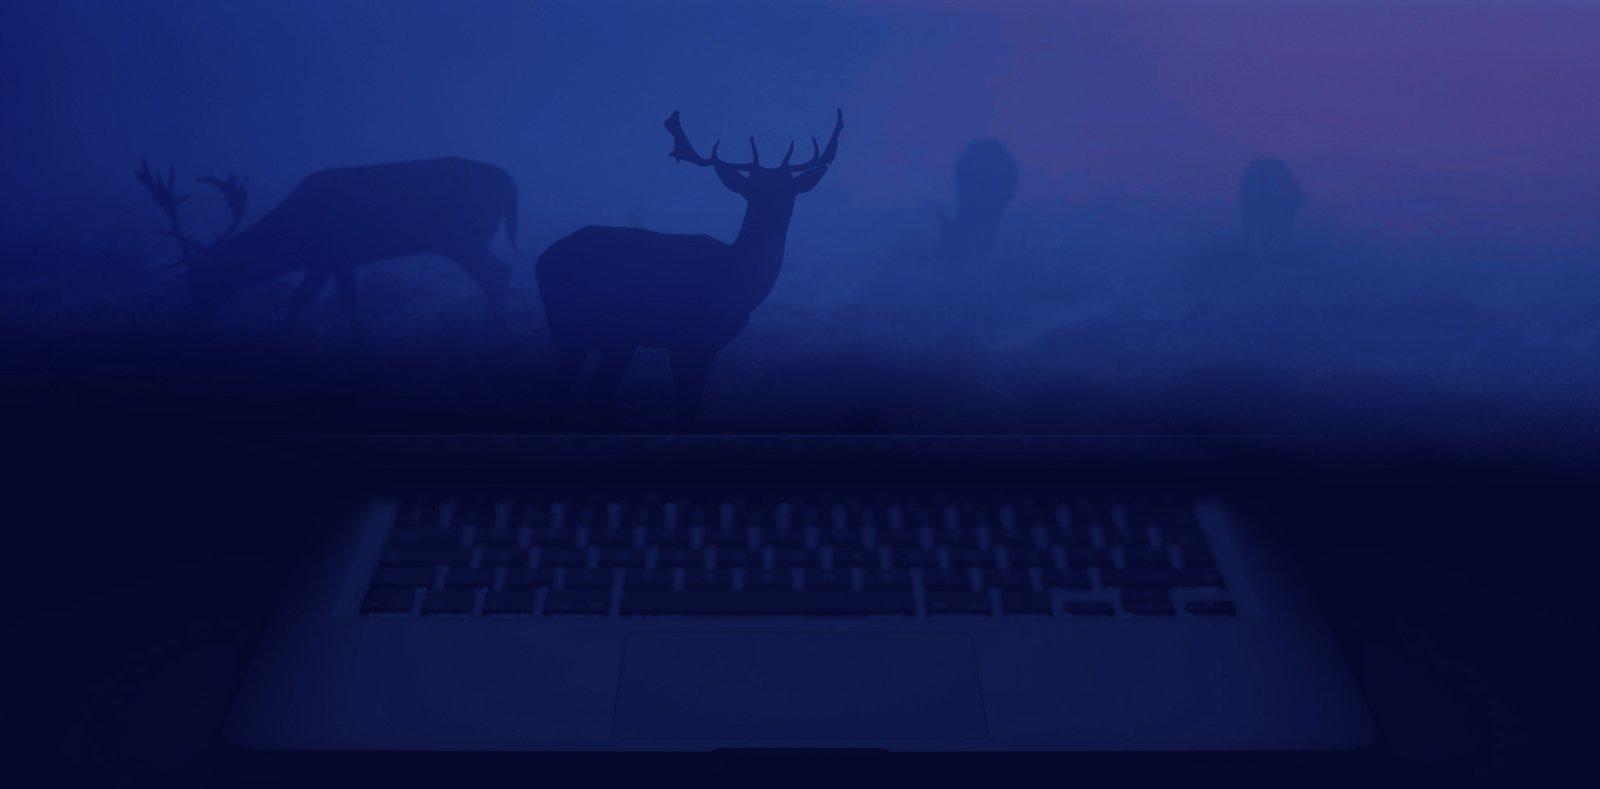 Themewolves slider web design background